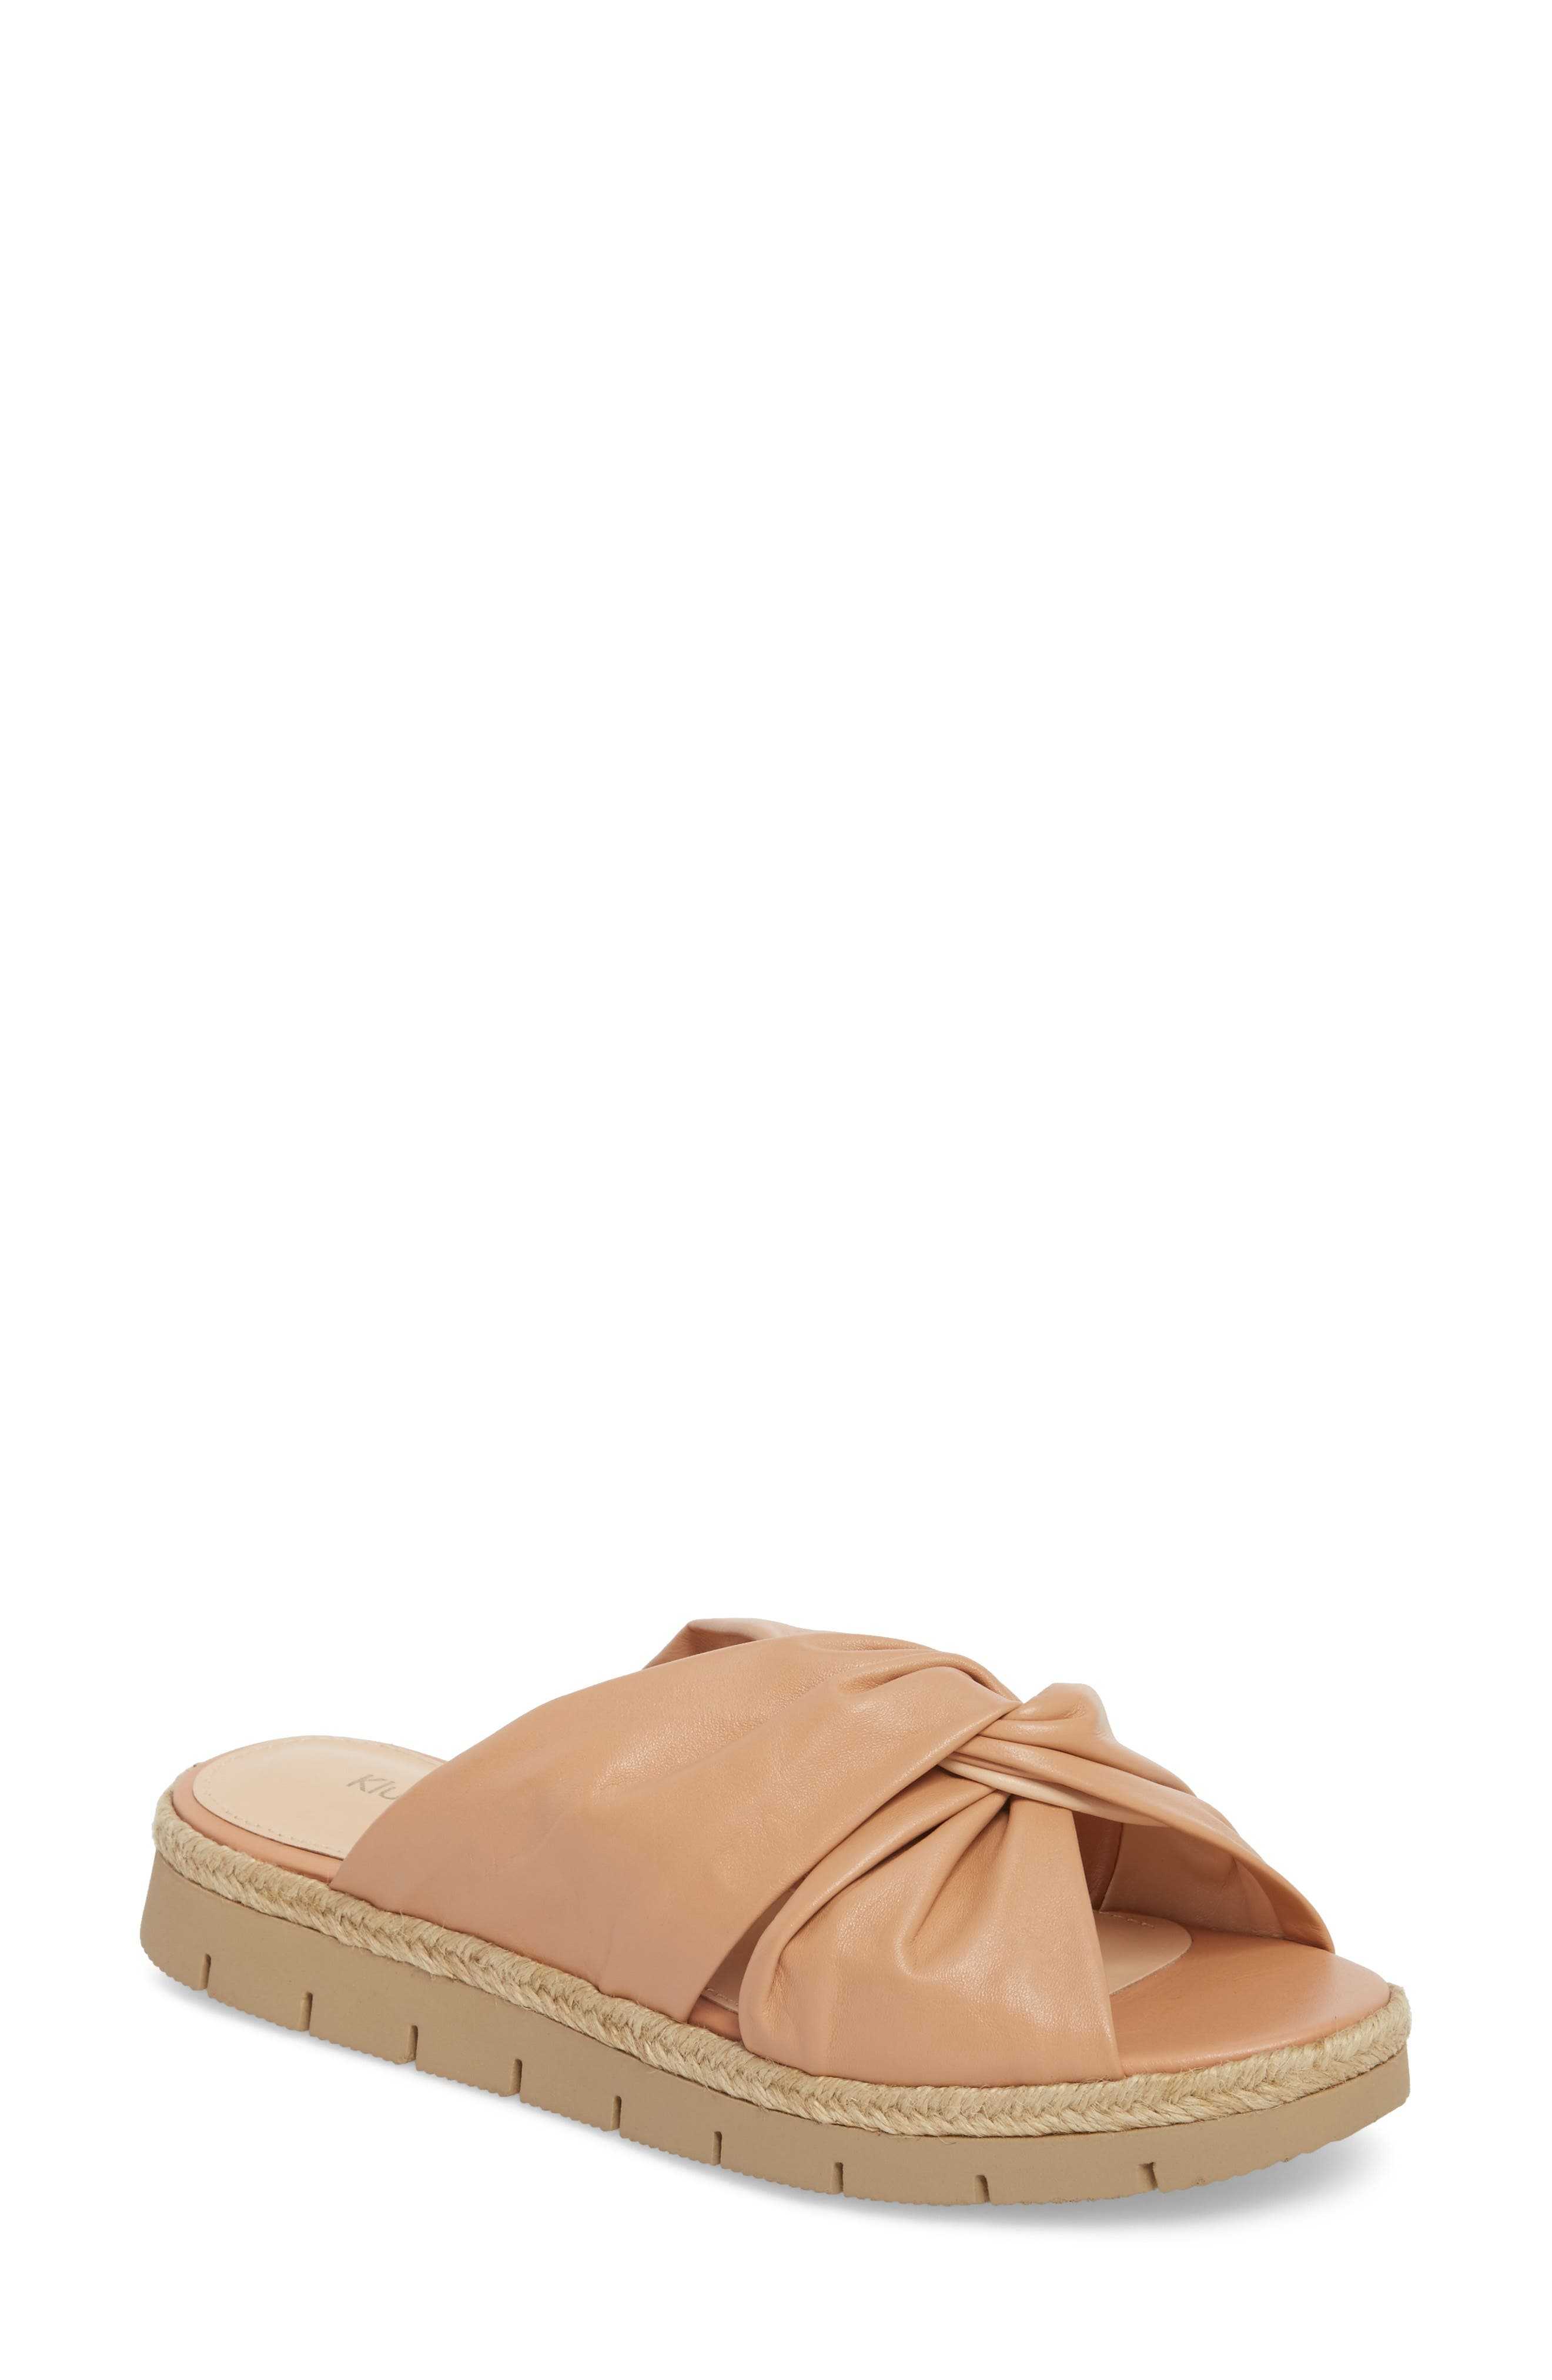 Charlie Slide Sandal,                         Main,                         color, Peach Leather